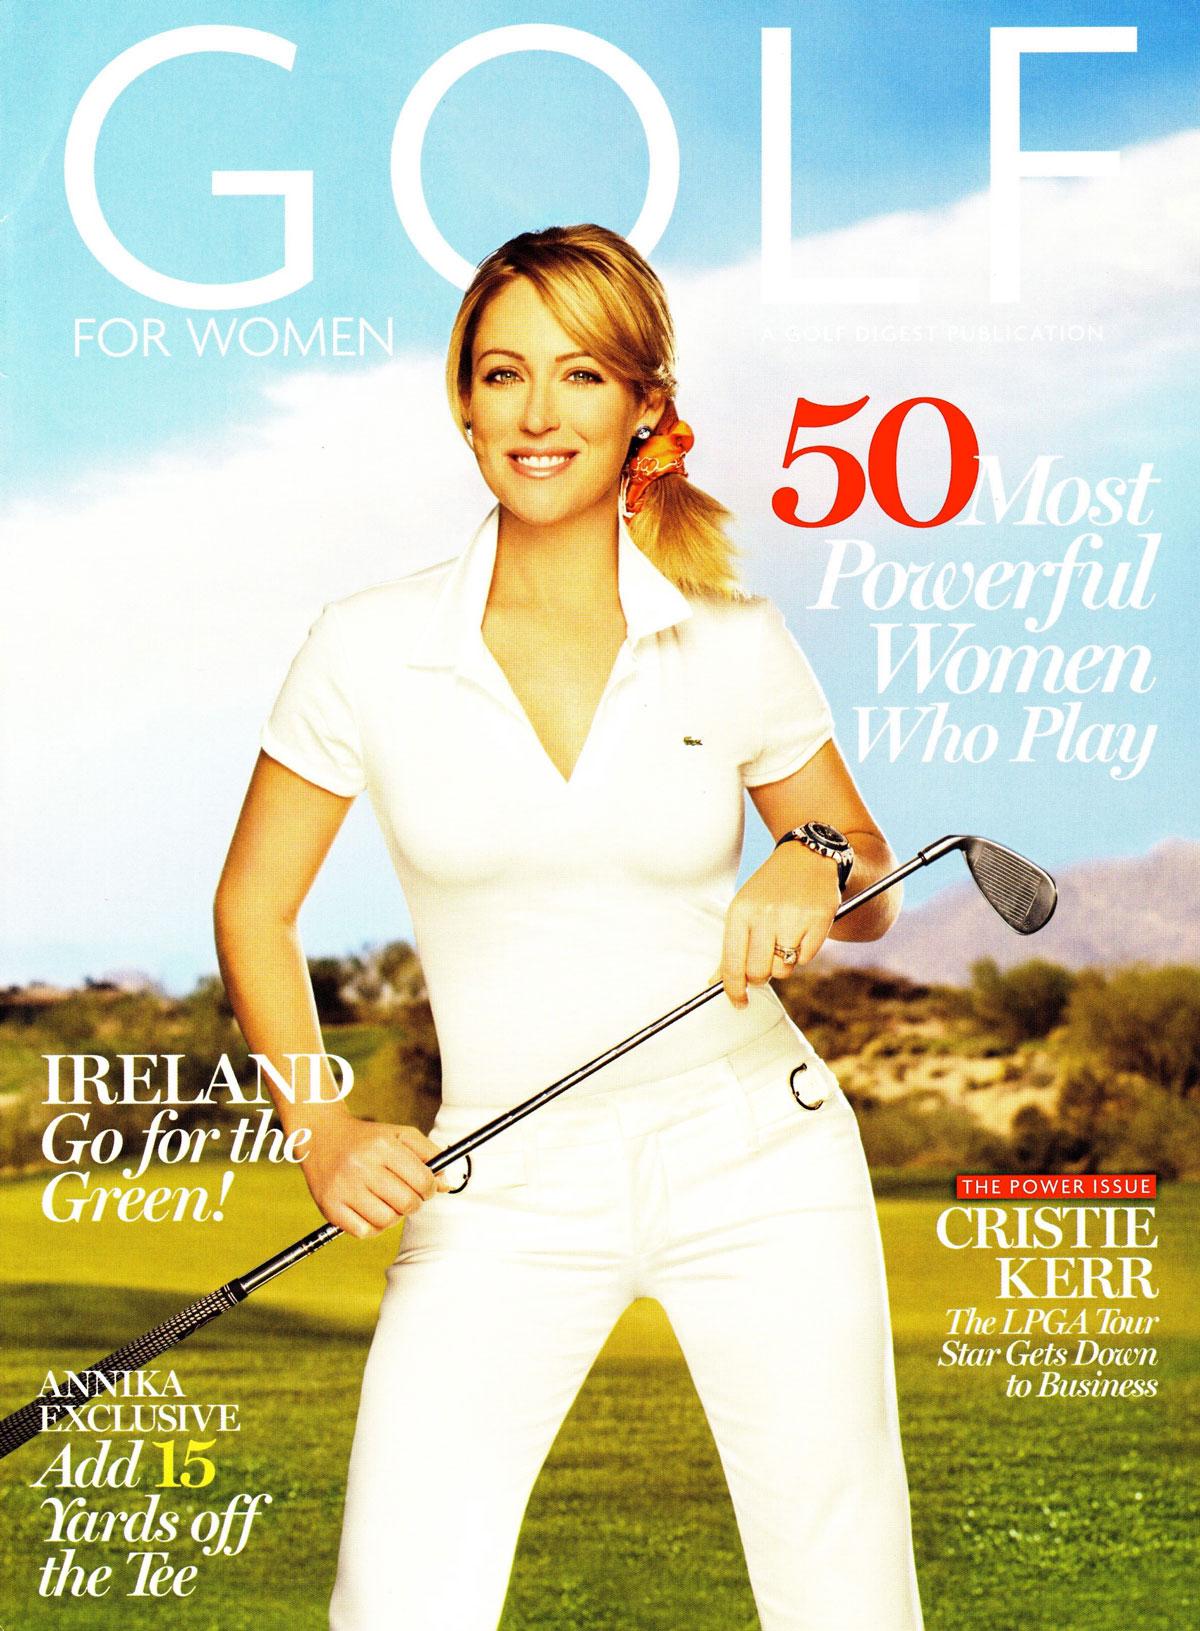 Golf Digest | Cristie Kerr